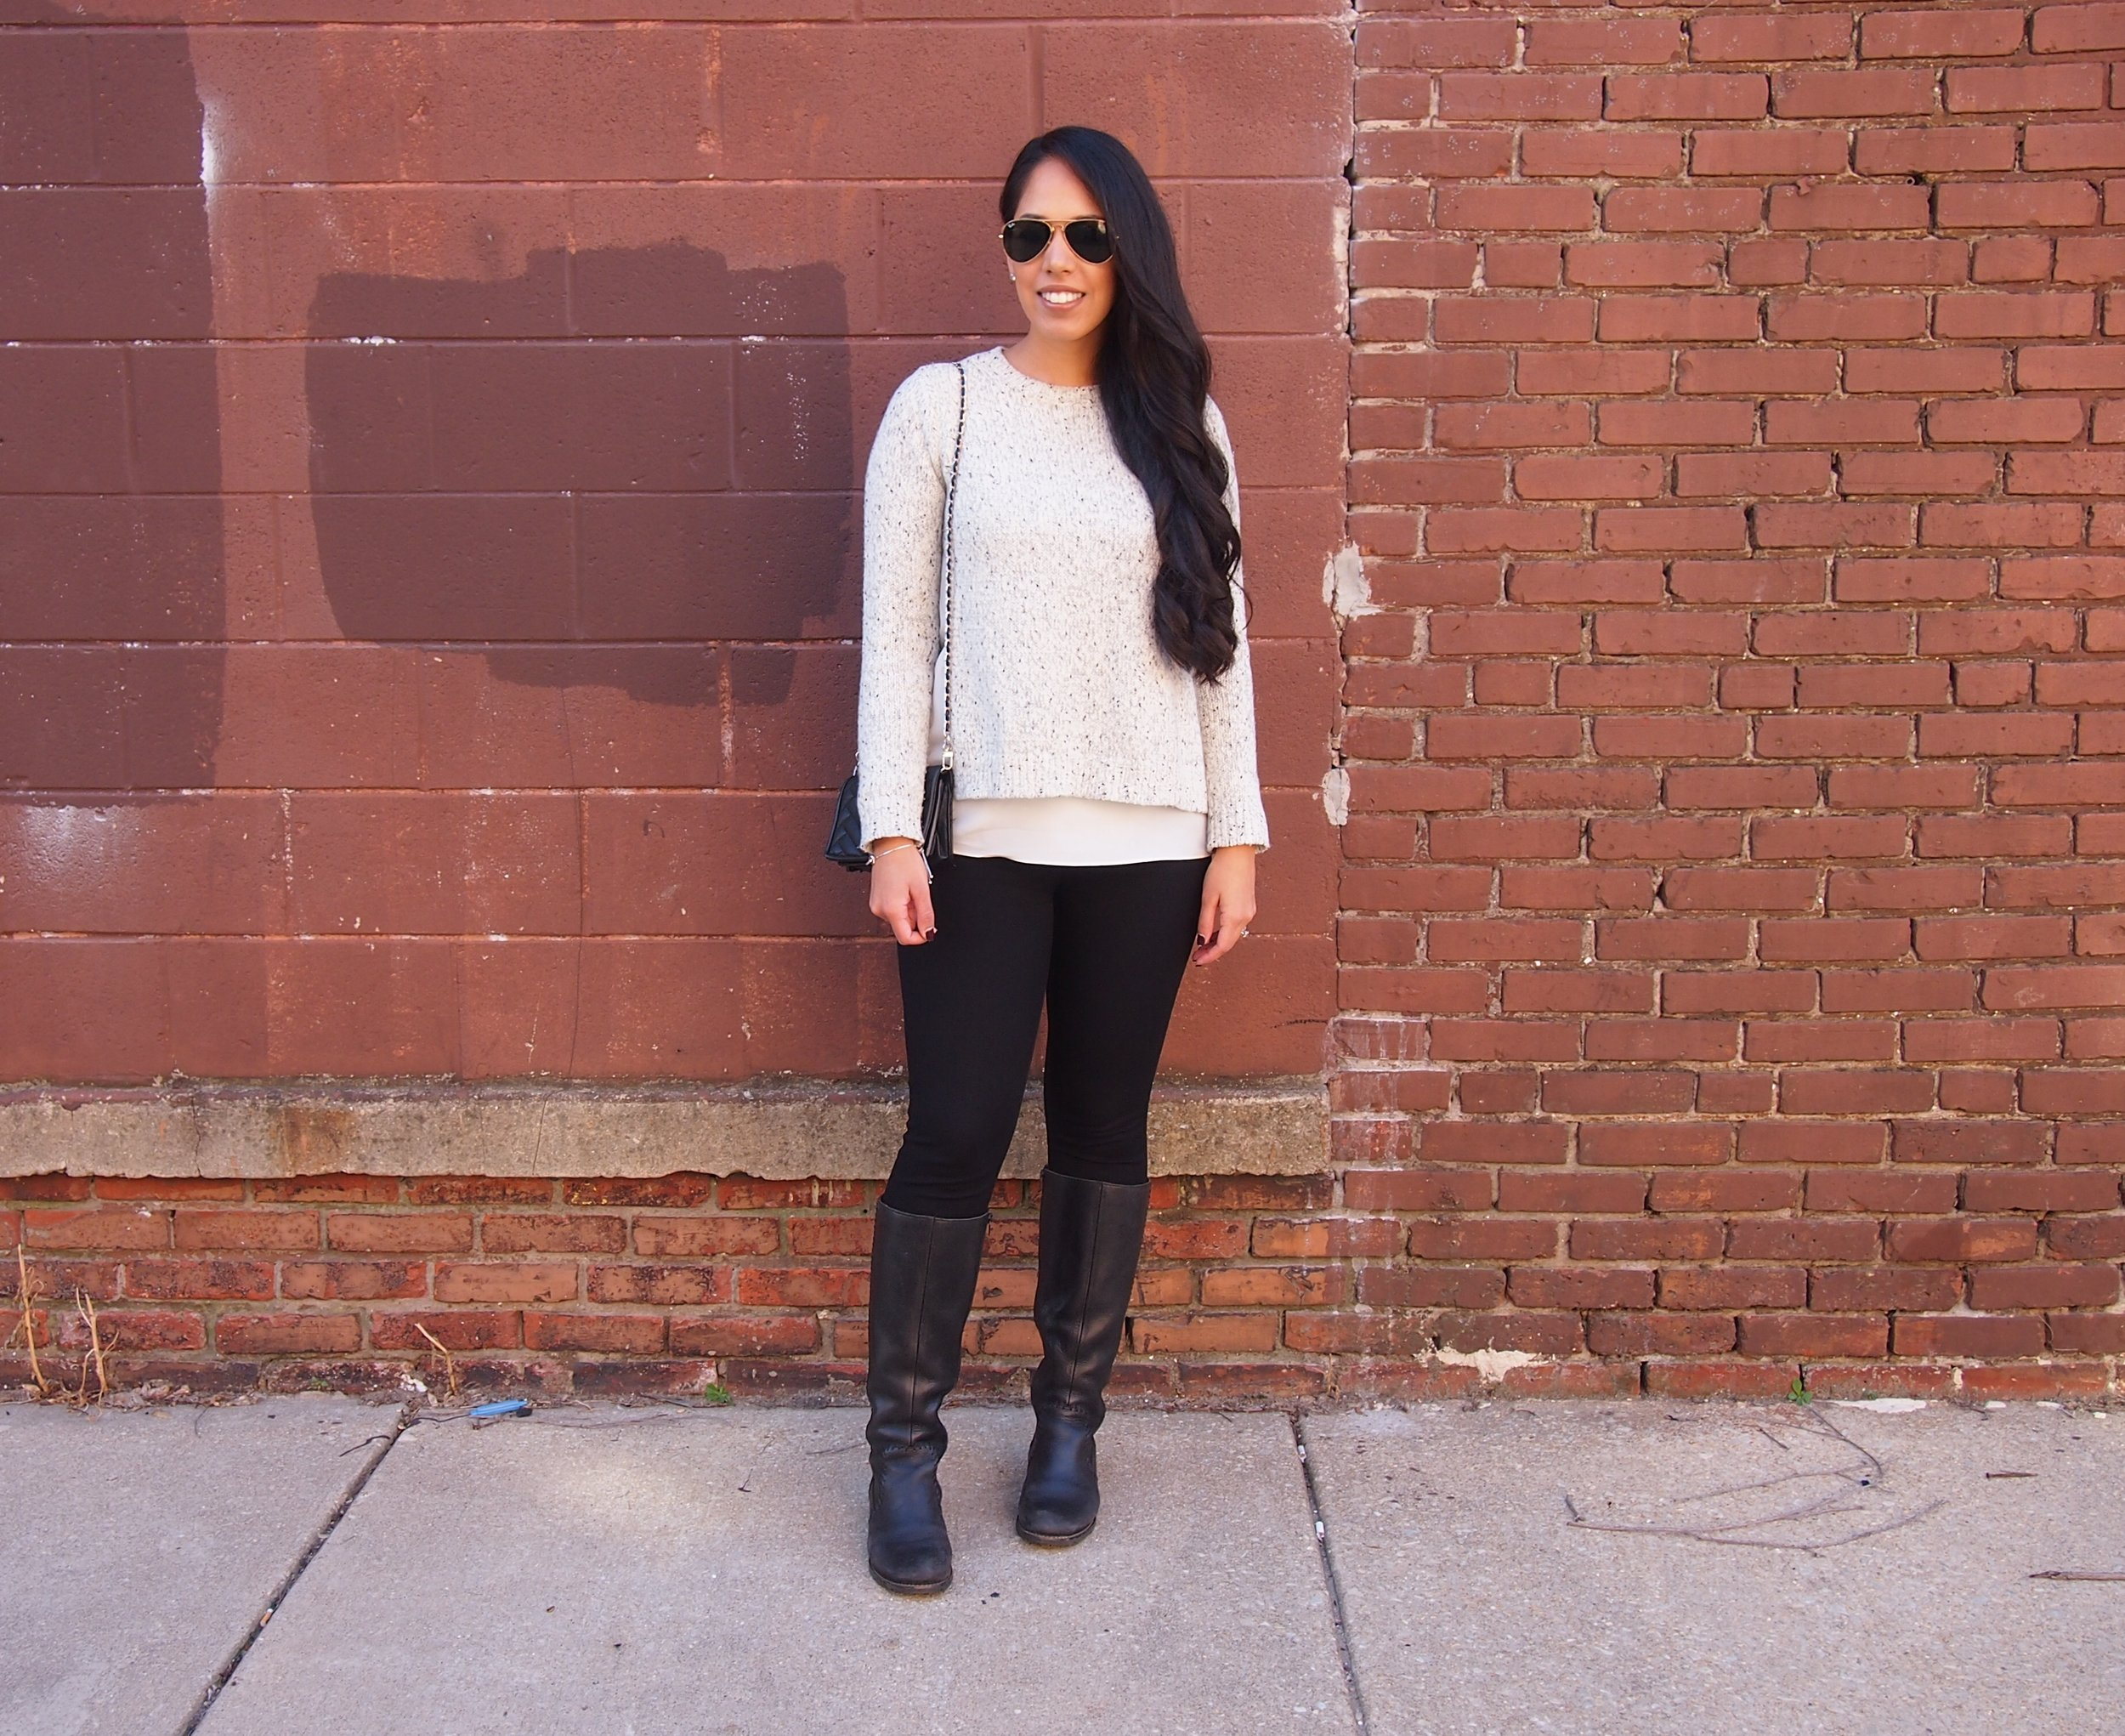 Winter-Fashion-Outfit-Idea